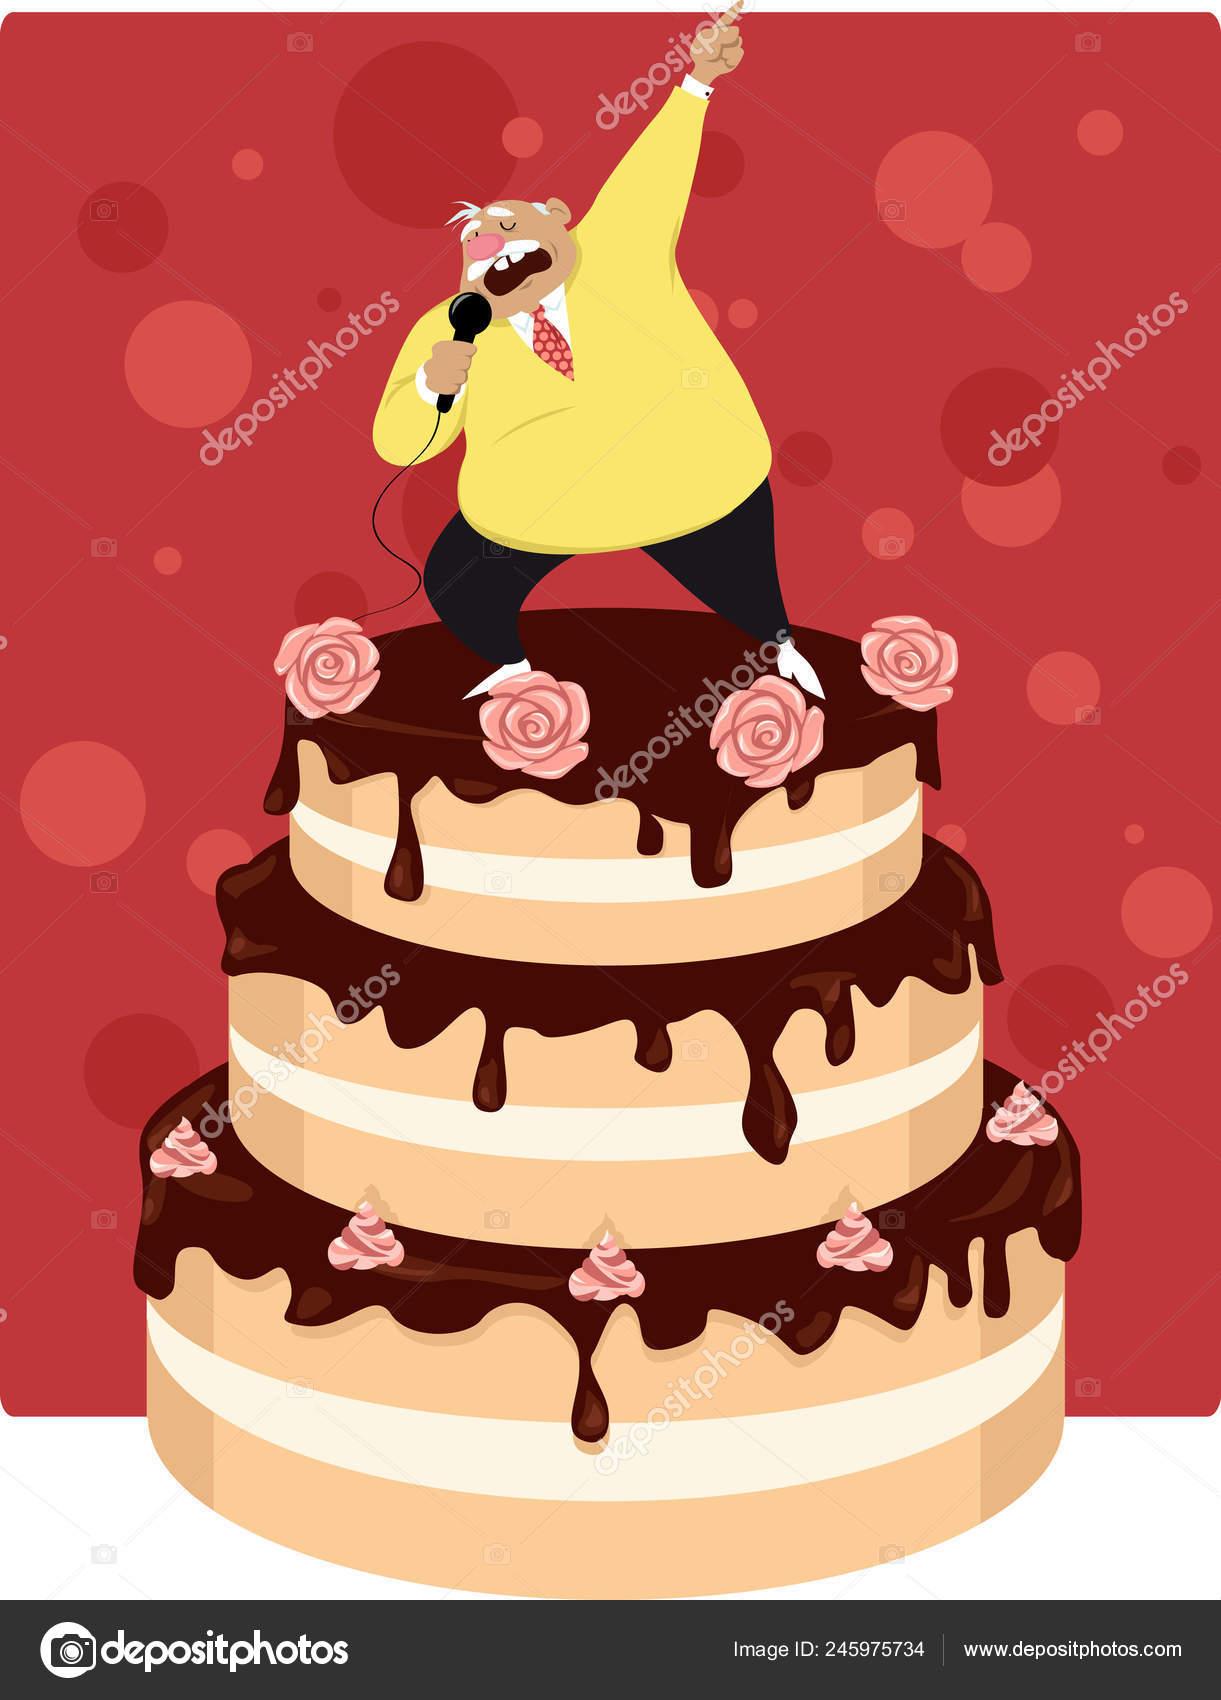 Sensational Funny Birthday Cake For Old Man Funny Old Man Singing Top Tiered Personalised Birthday Cards Vishlily Jamesorg